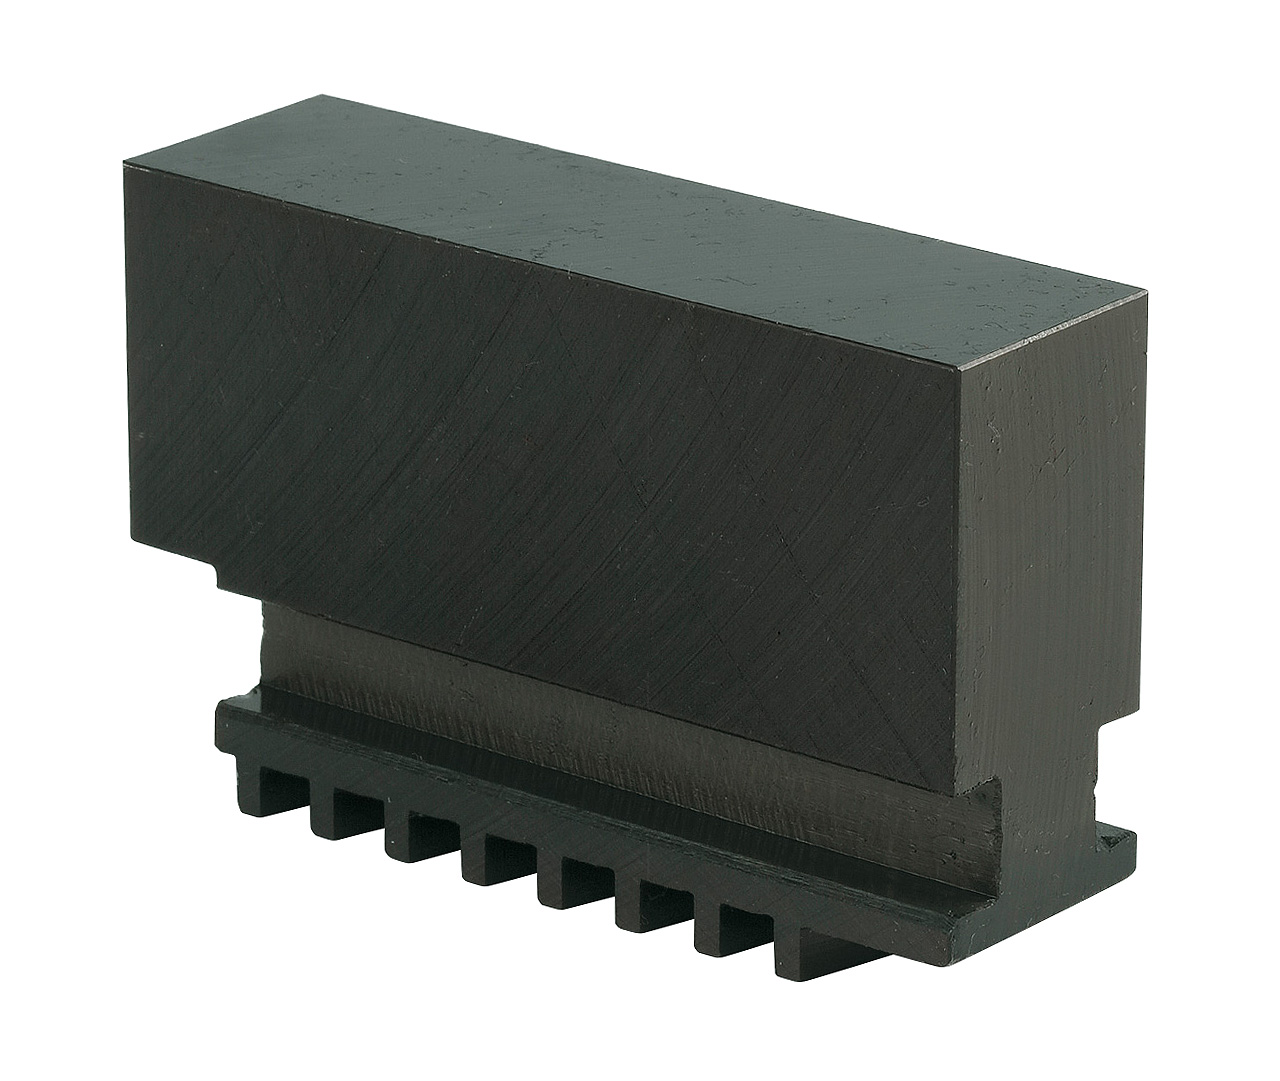 Szczęki jednolite miękkie - komplet  DSJ-DK11-100 BERNARDO